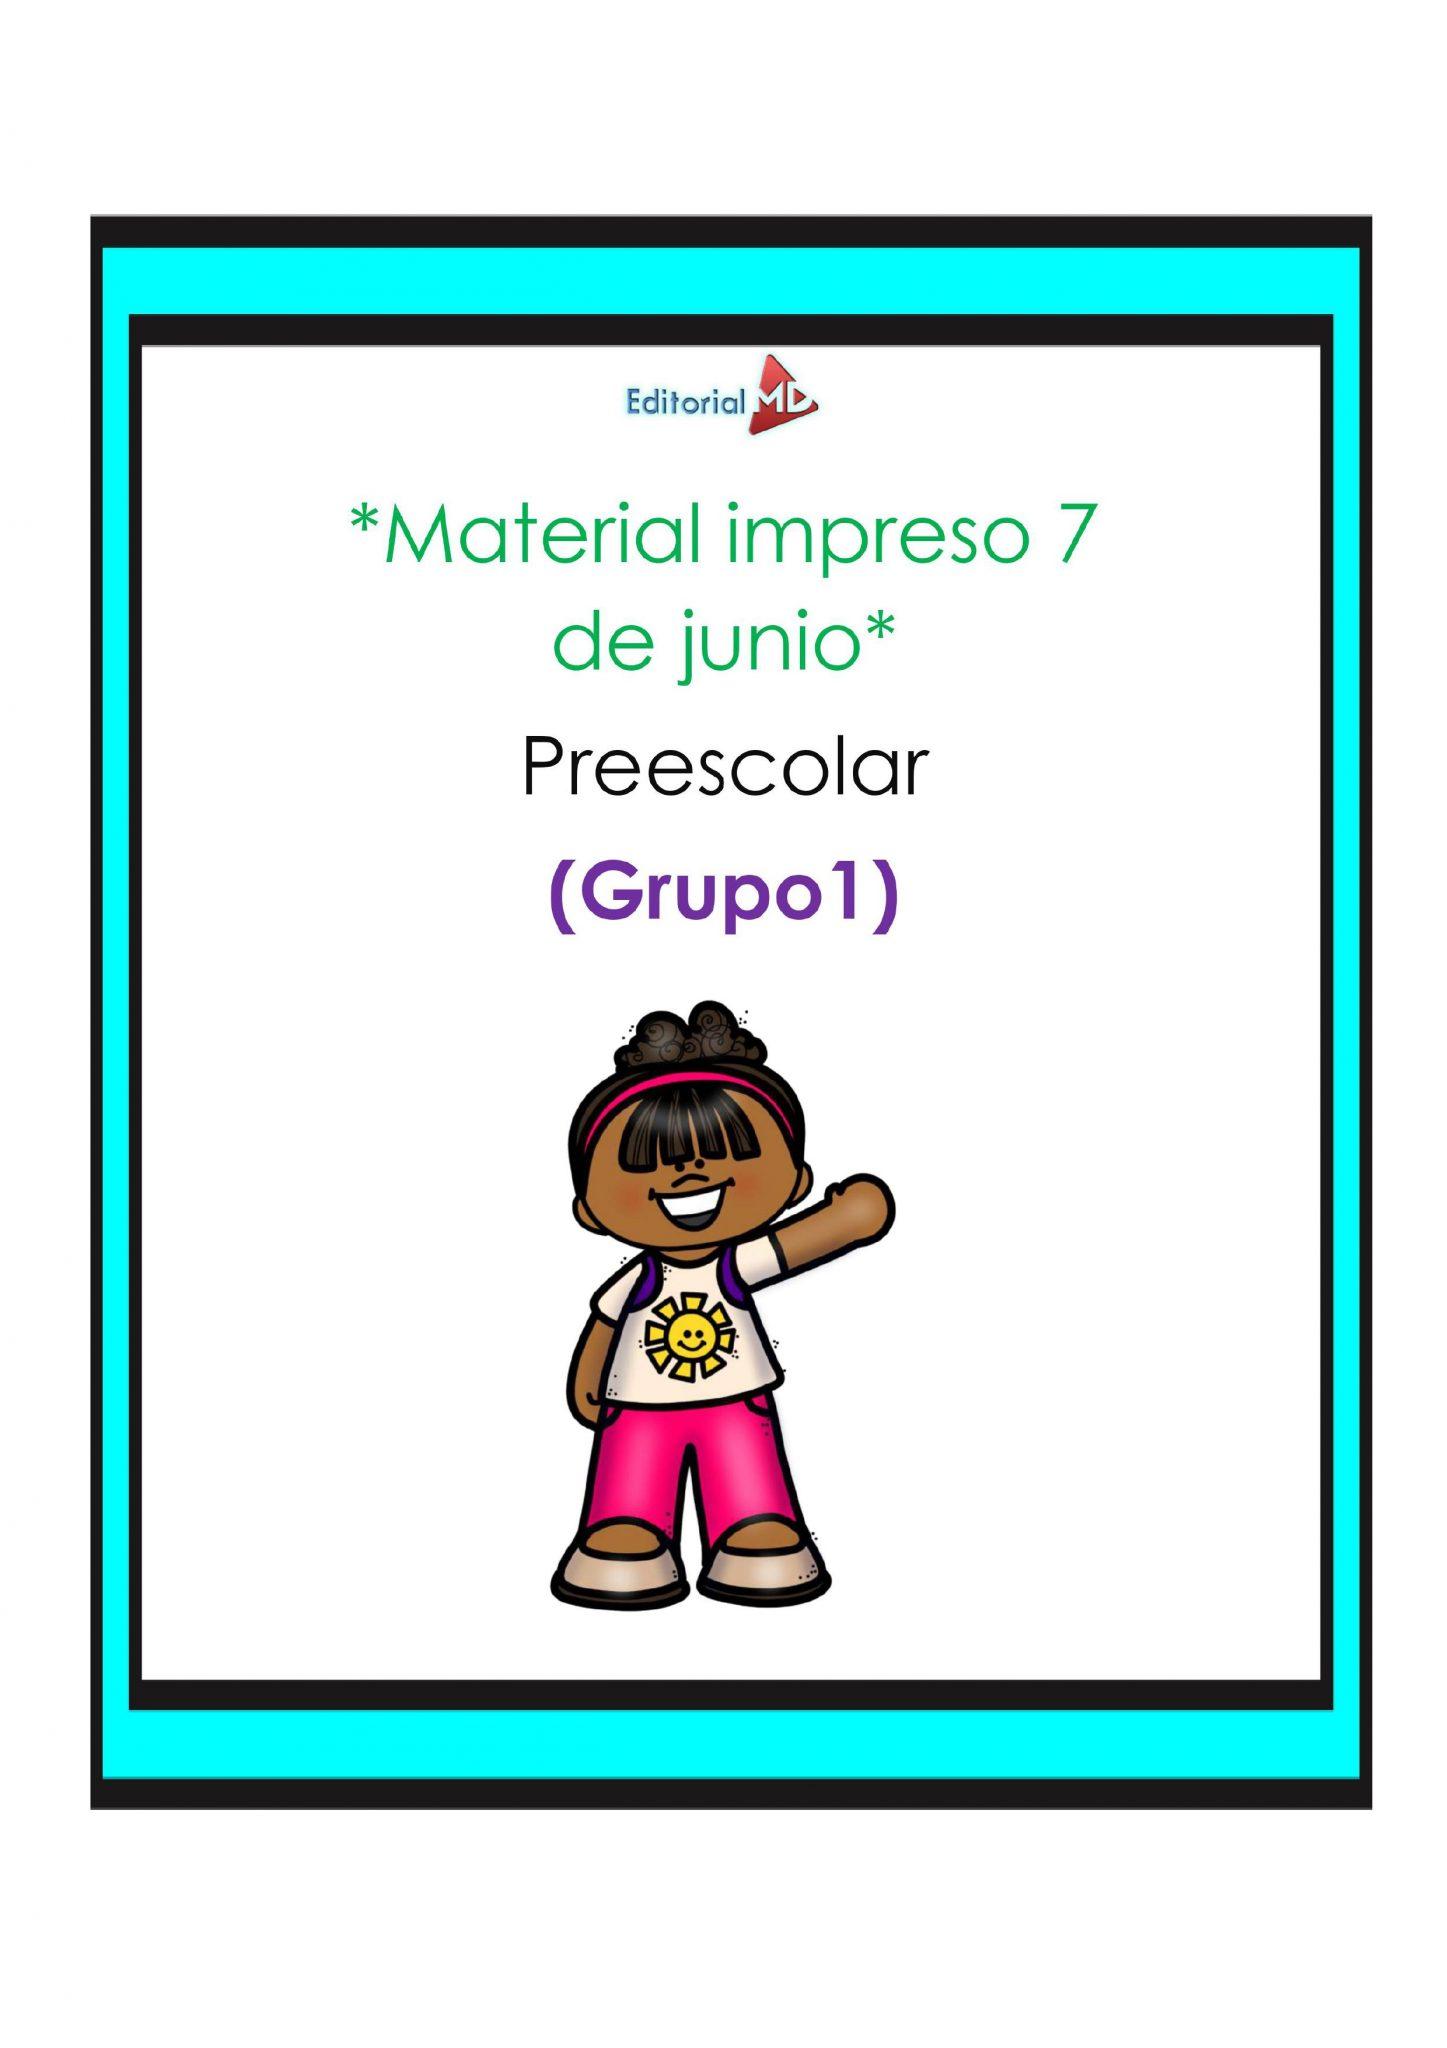 Ejemplo Material de apoyo semana 37 preescolar 01